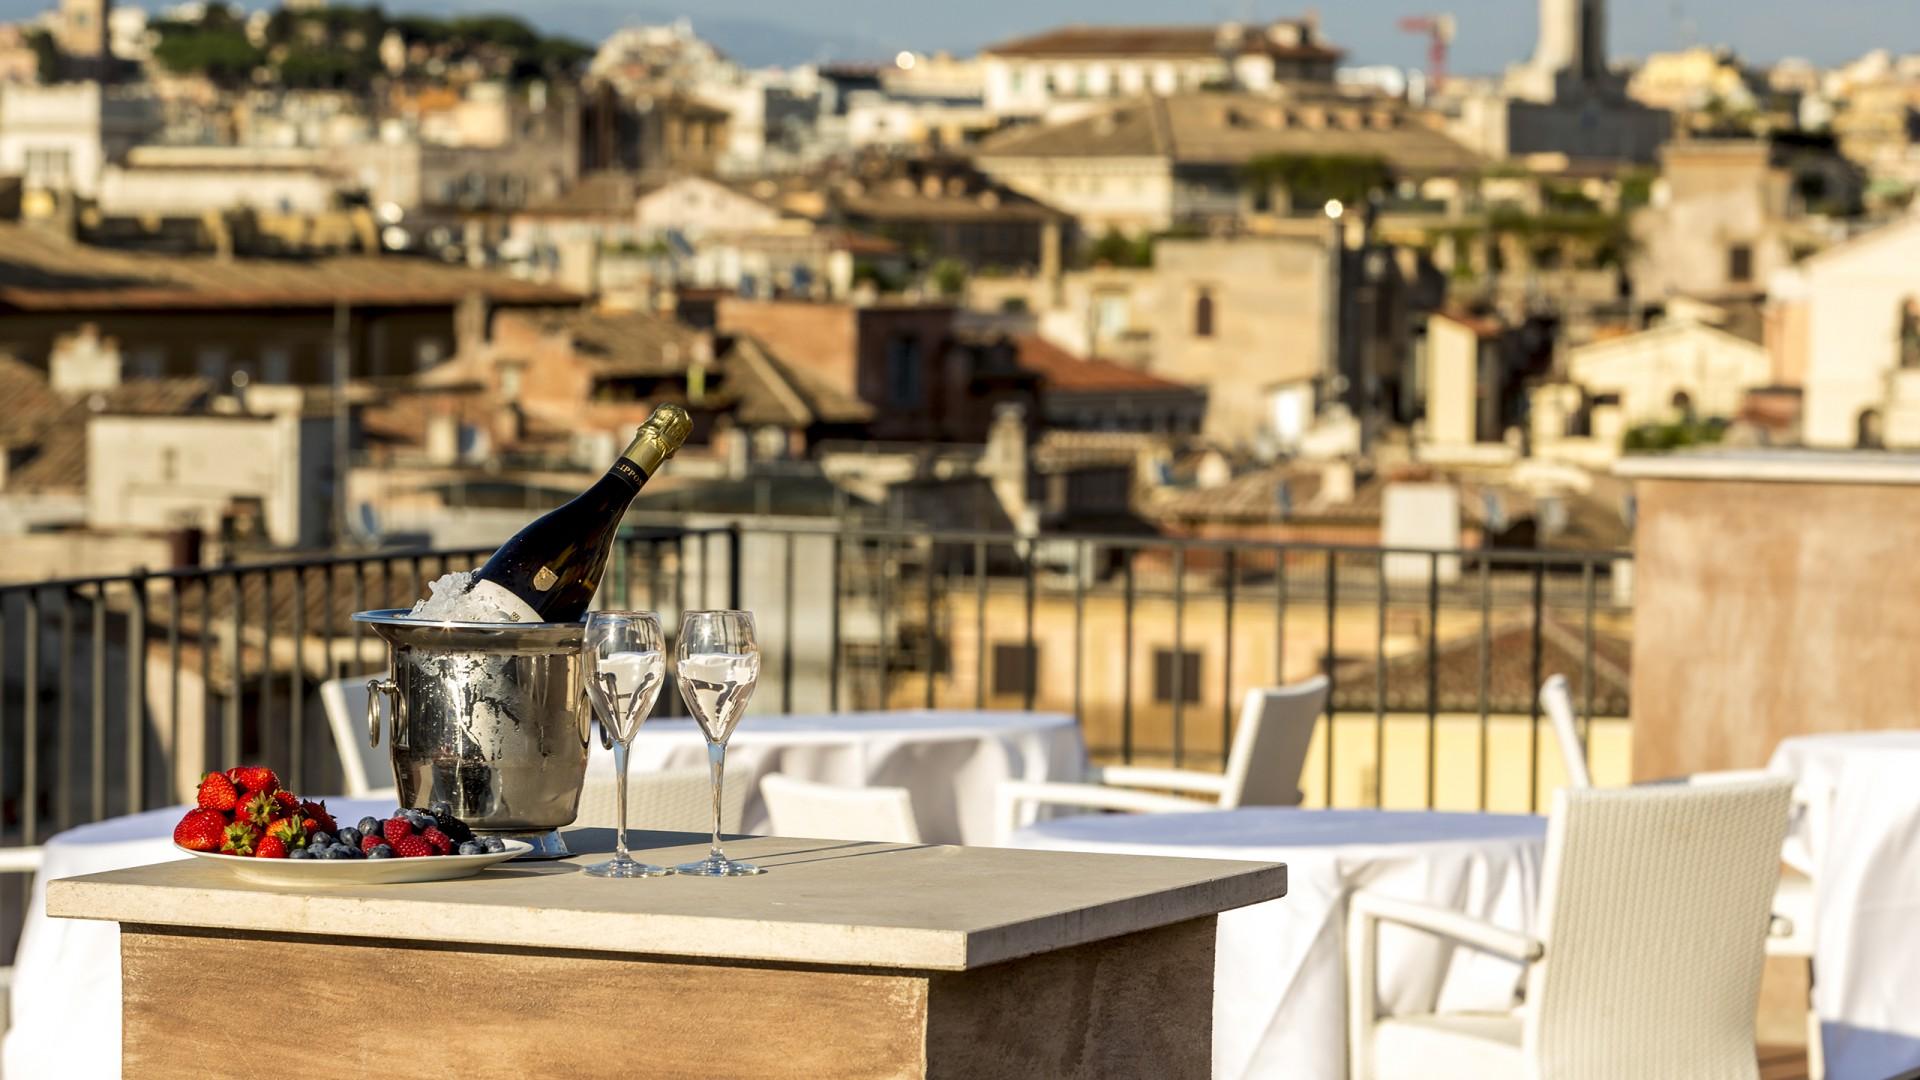 Hotel-Eitch-Borromini-Rome-roof-top-Bar-9940